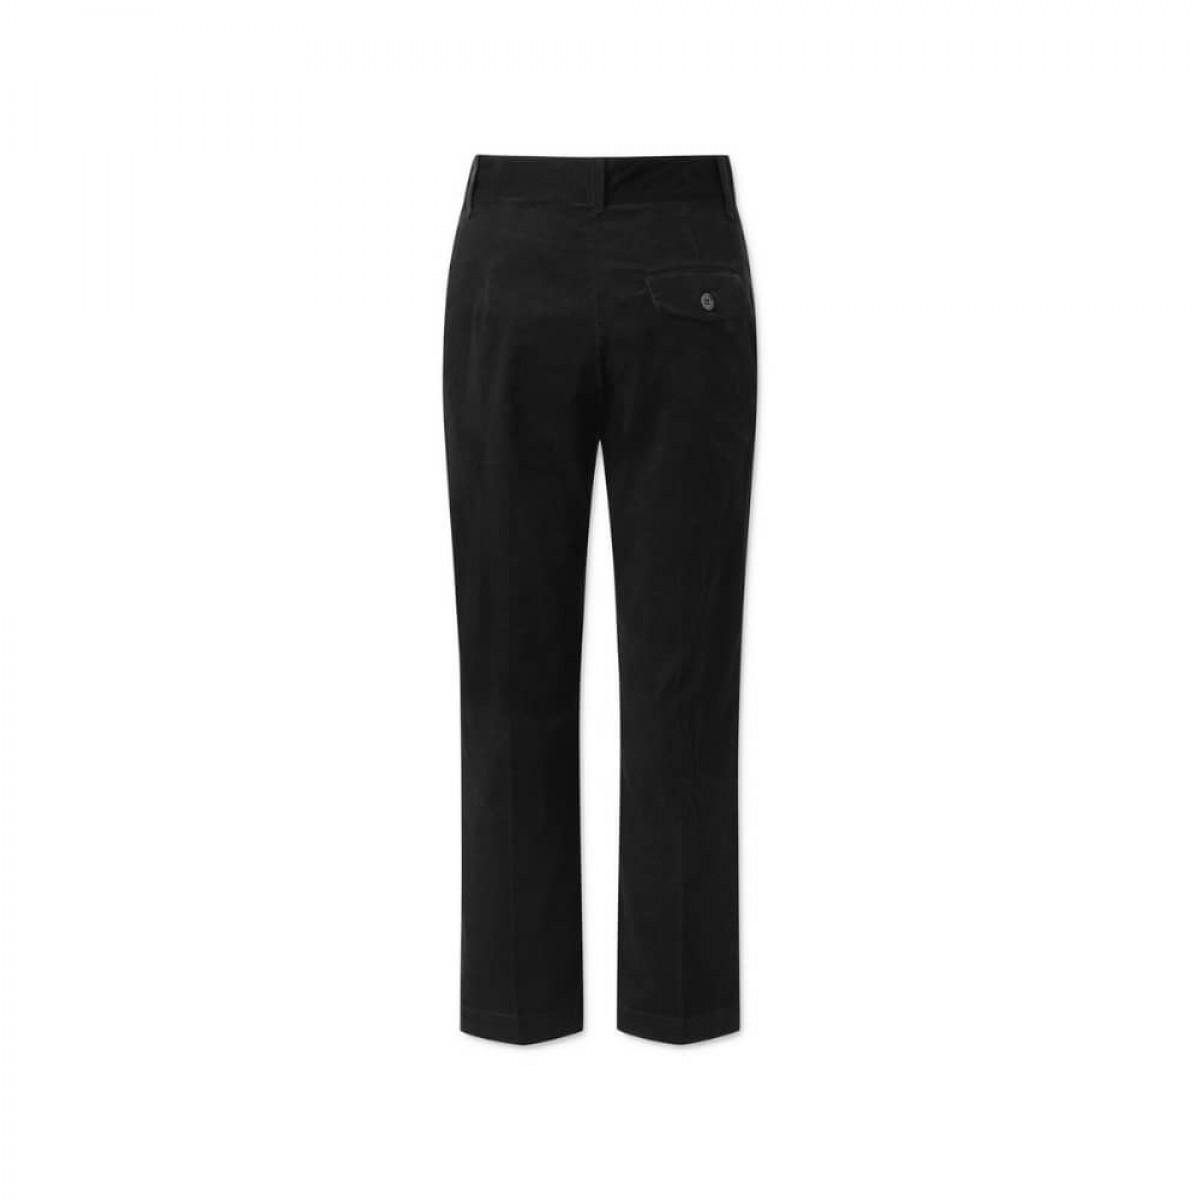 coppola pants - black fløjl